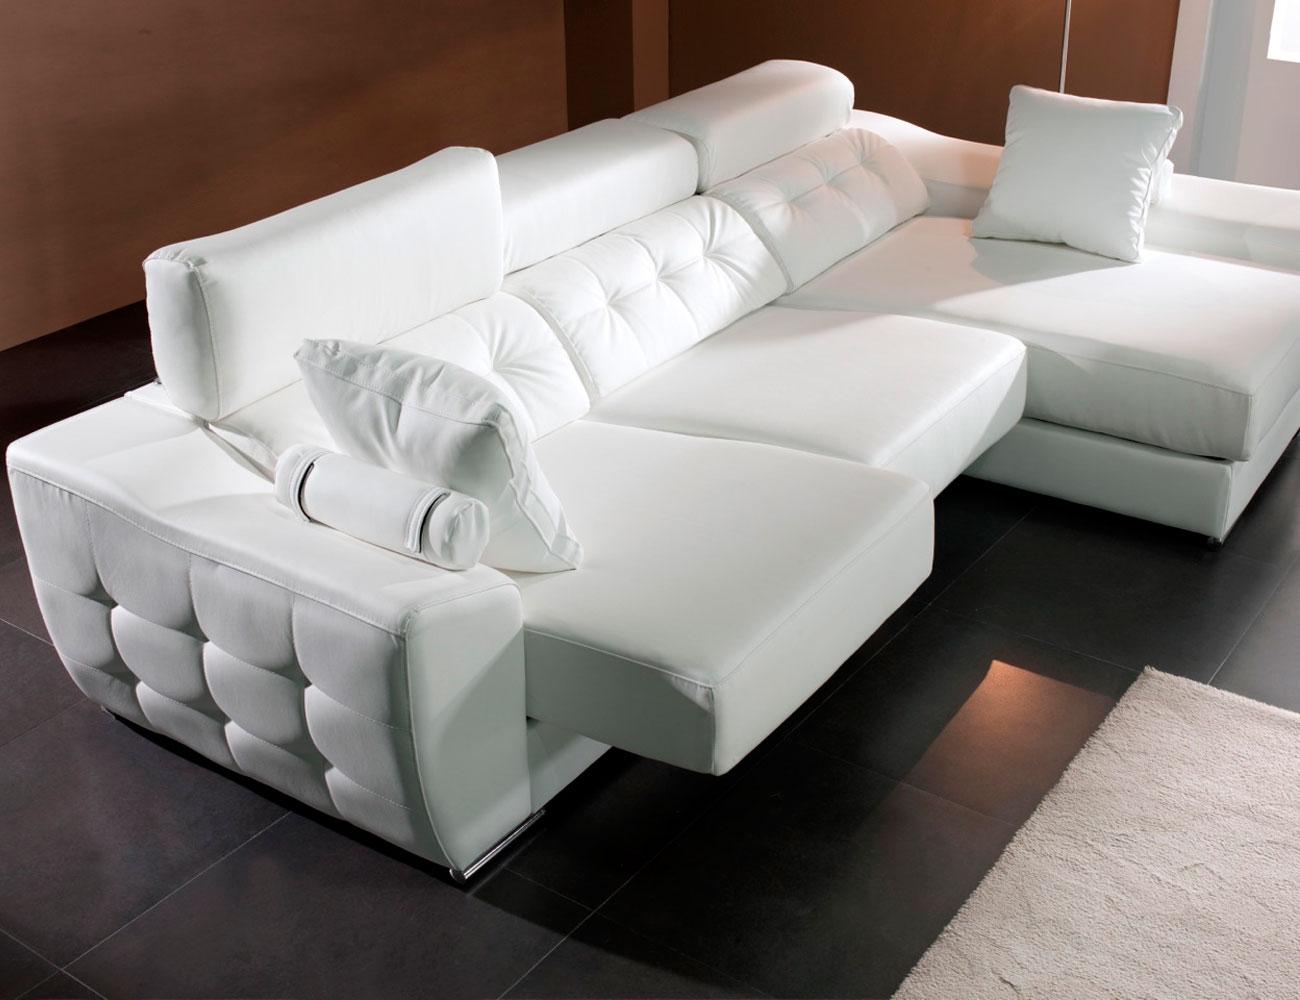 Sofa chaiselongue moderno capitone polipiel blanco8